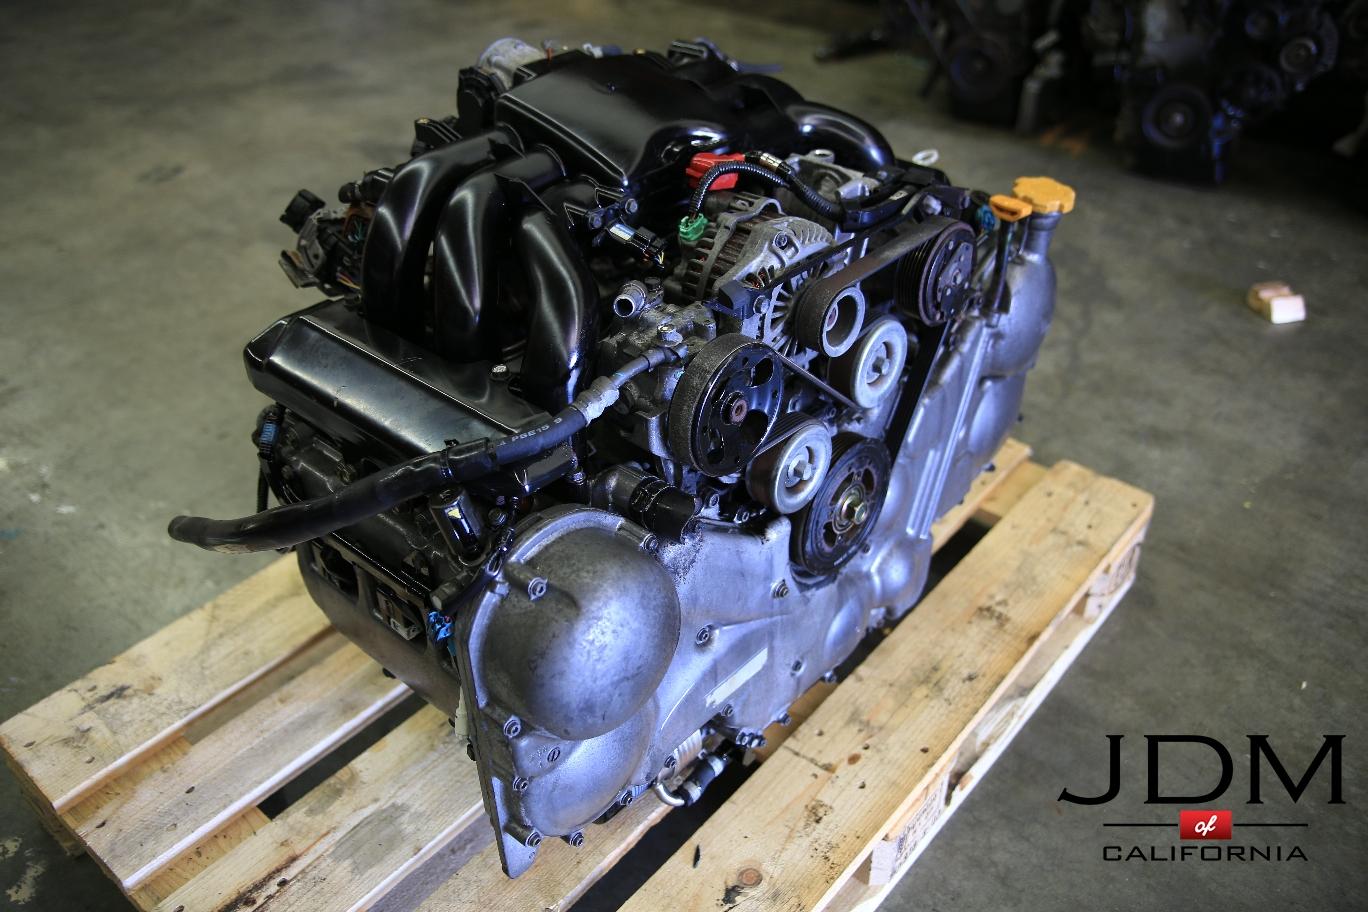 JDM EZ30D 3 0L H6 Engine For Subaru Legacy 03-09 / Subaru Outback 05-09 /  Subaru Tribeca 2006-2007